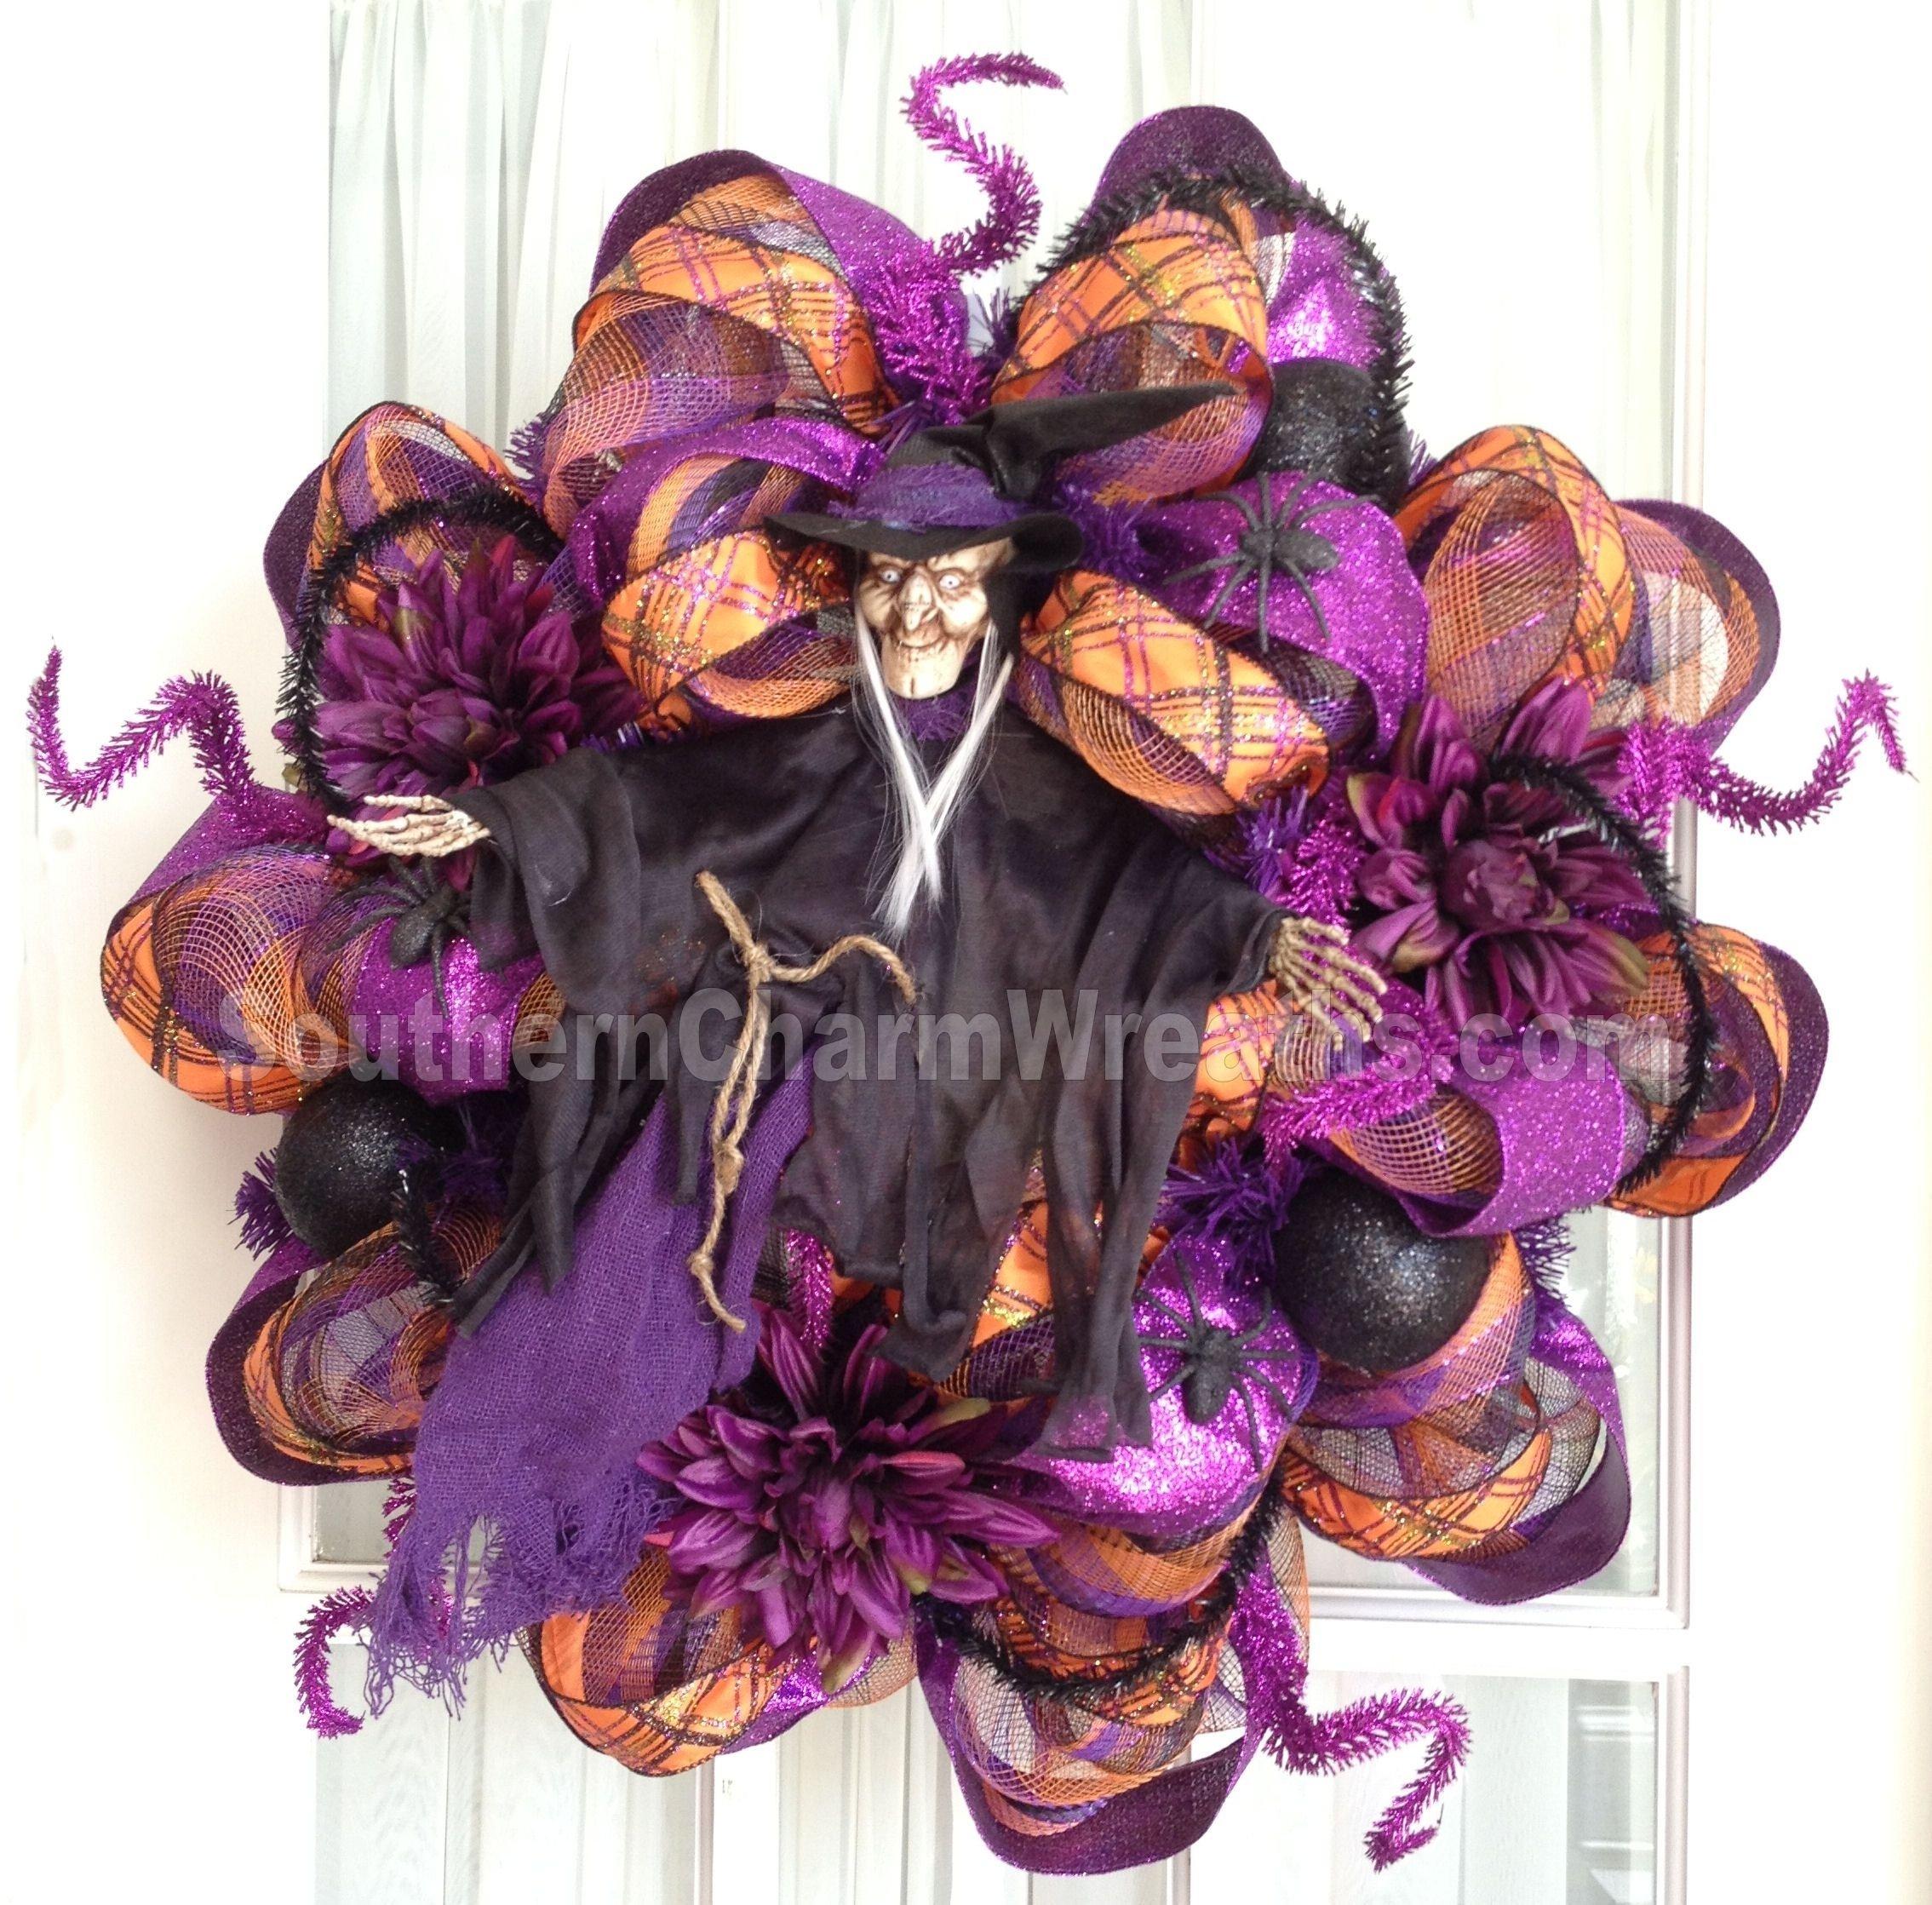 10 Unique Halloween Deco Mesh Wreath Ideas 20 best diy summer wreaths you can make at home wreaths halloween